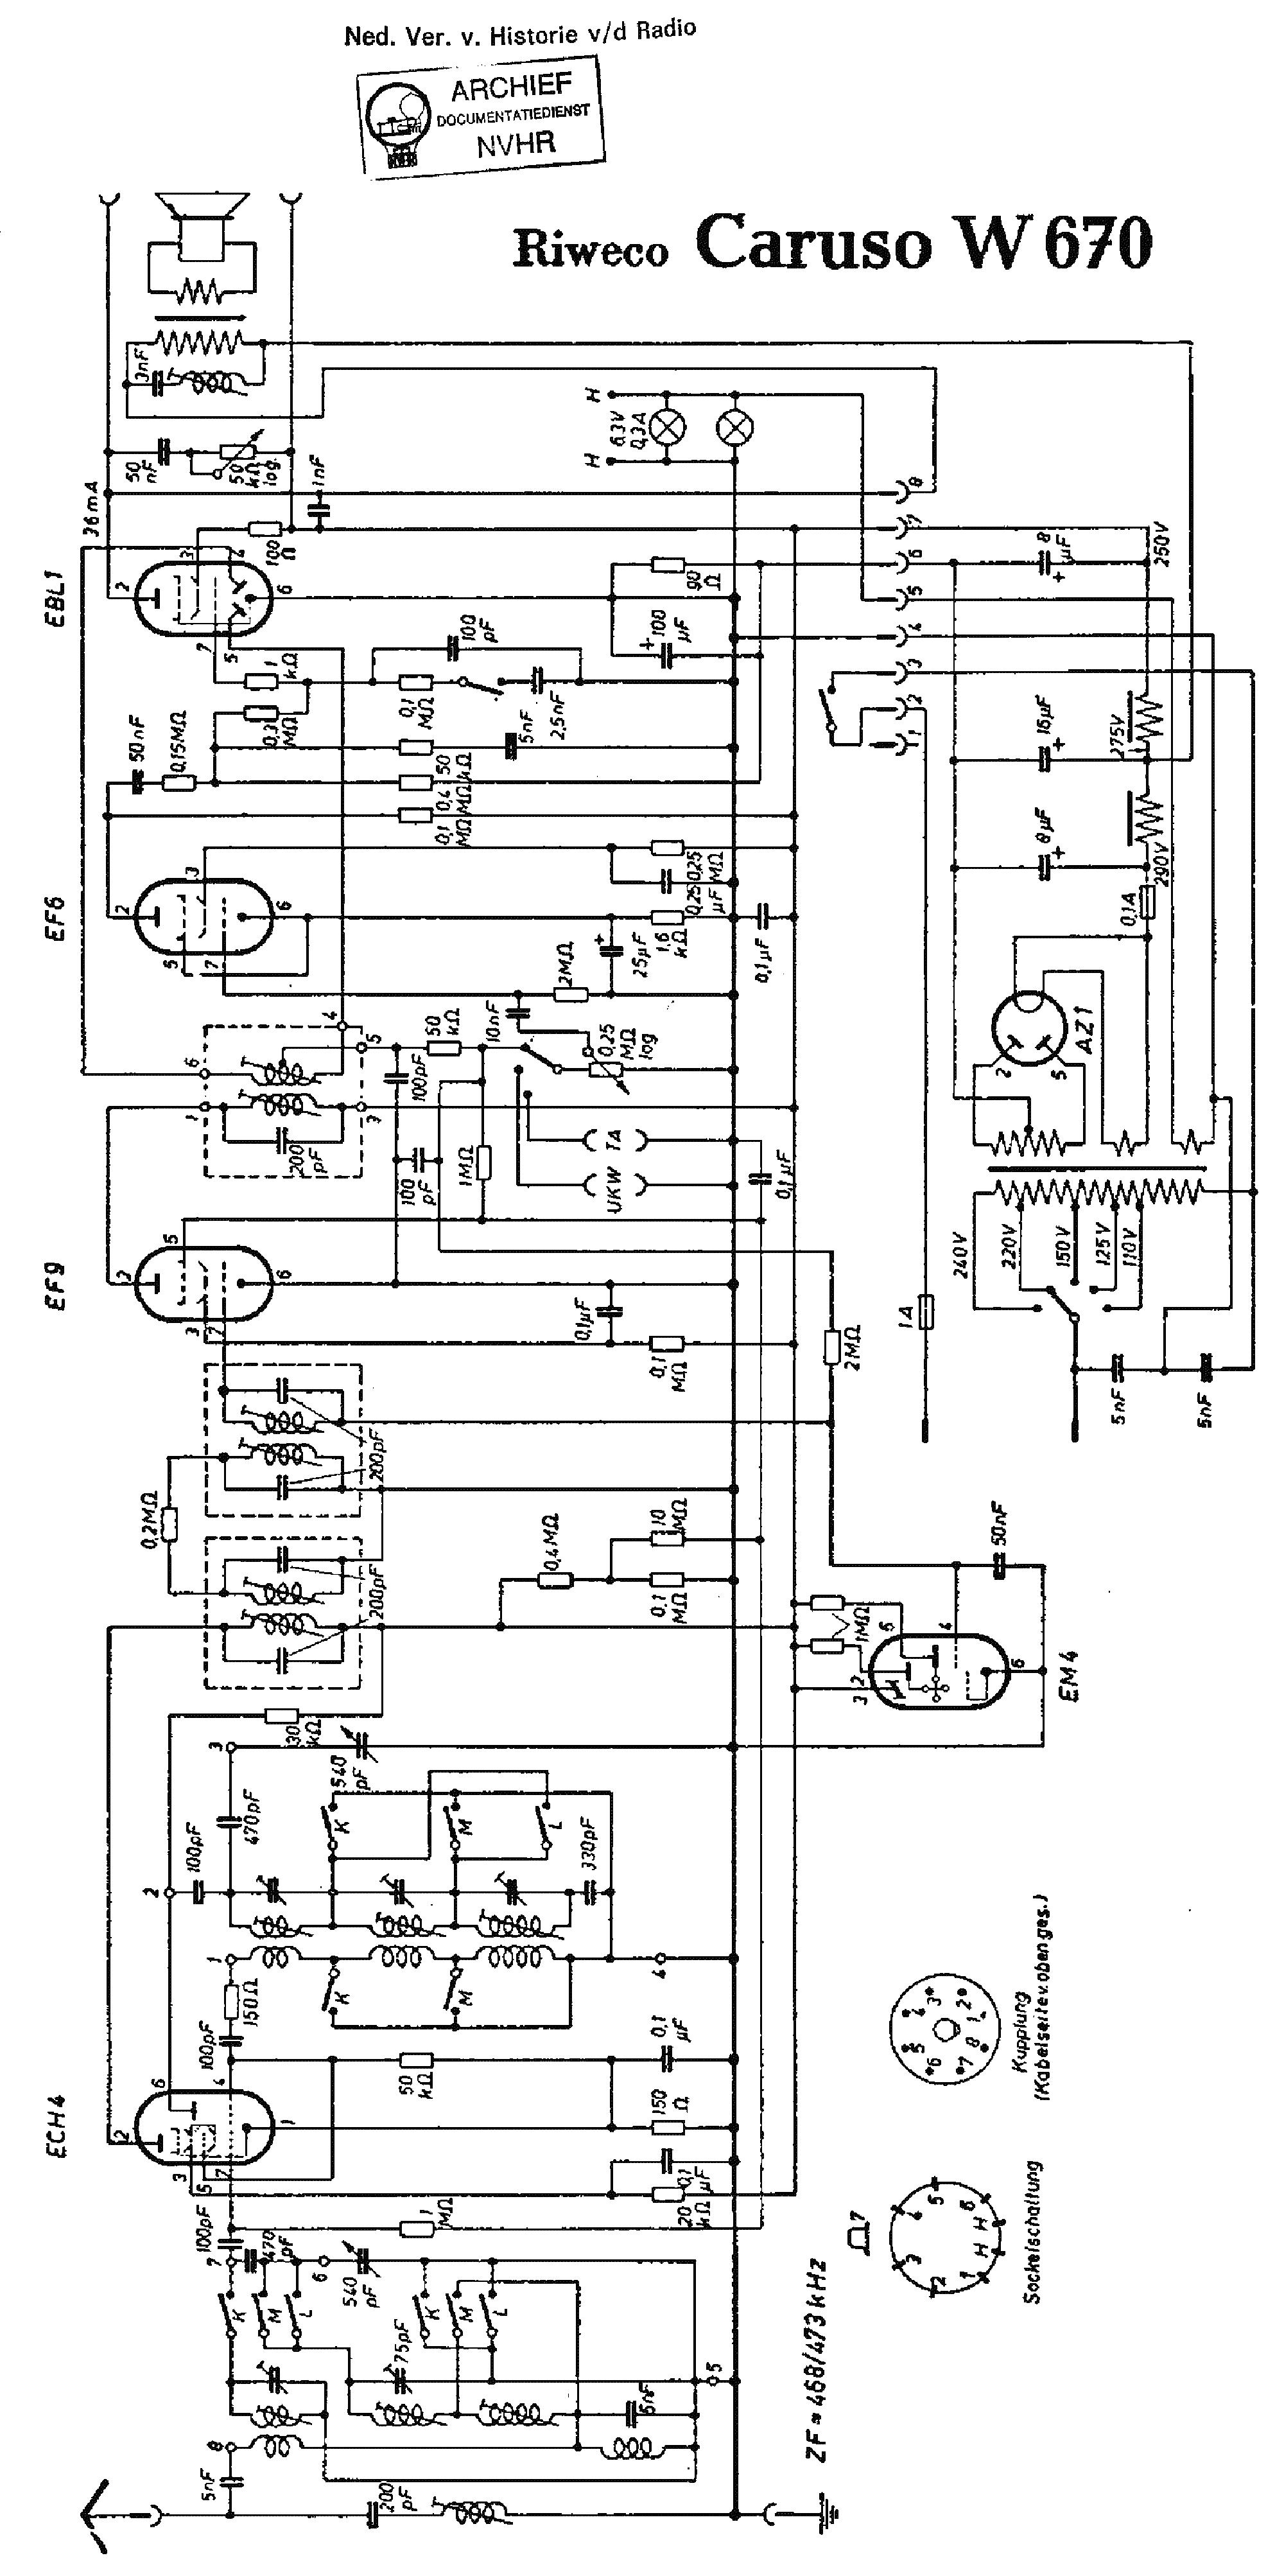 RIWECO W670 CARUSO AC RECEIVER SCH service manual (1st page)